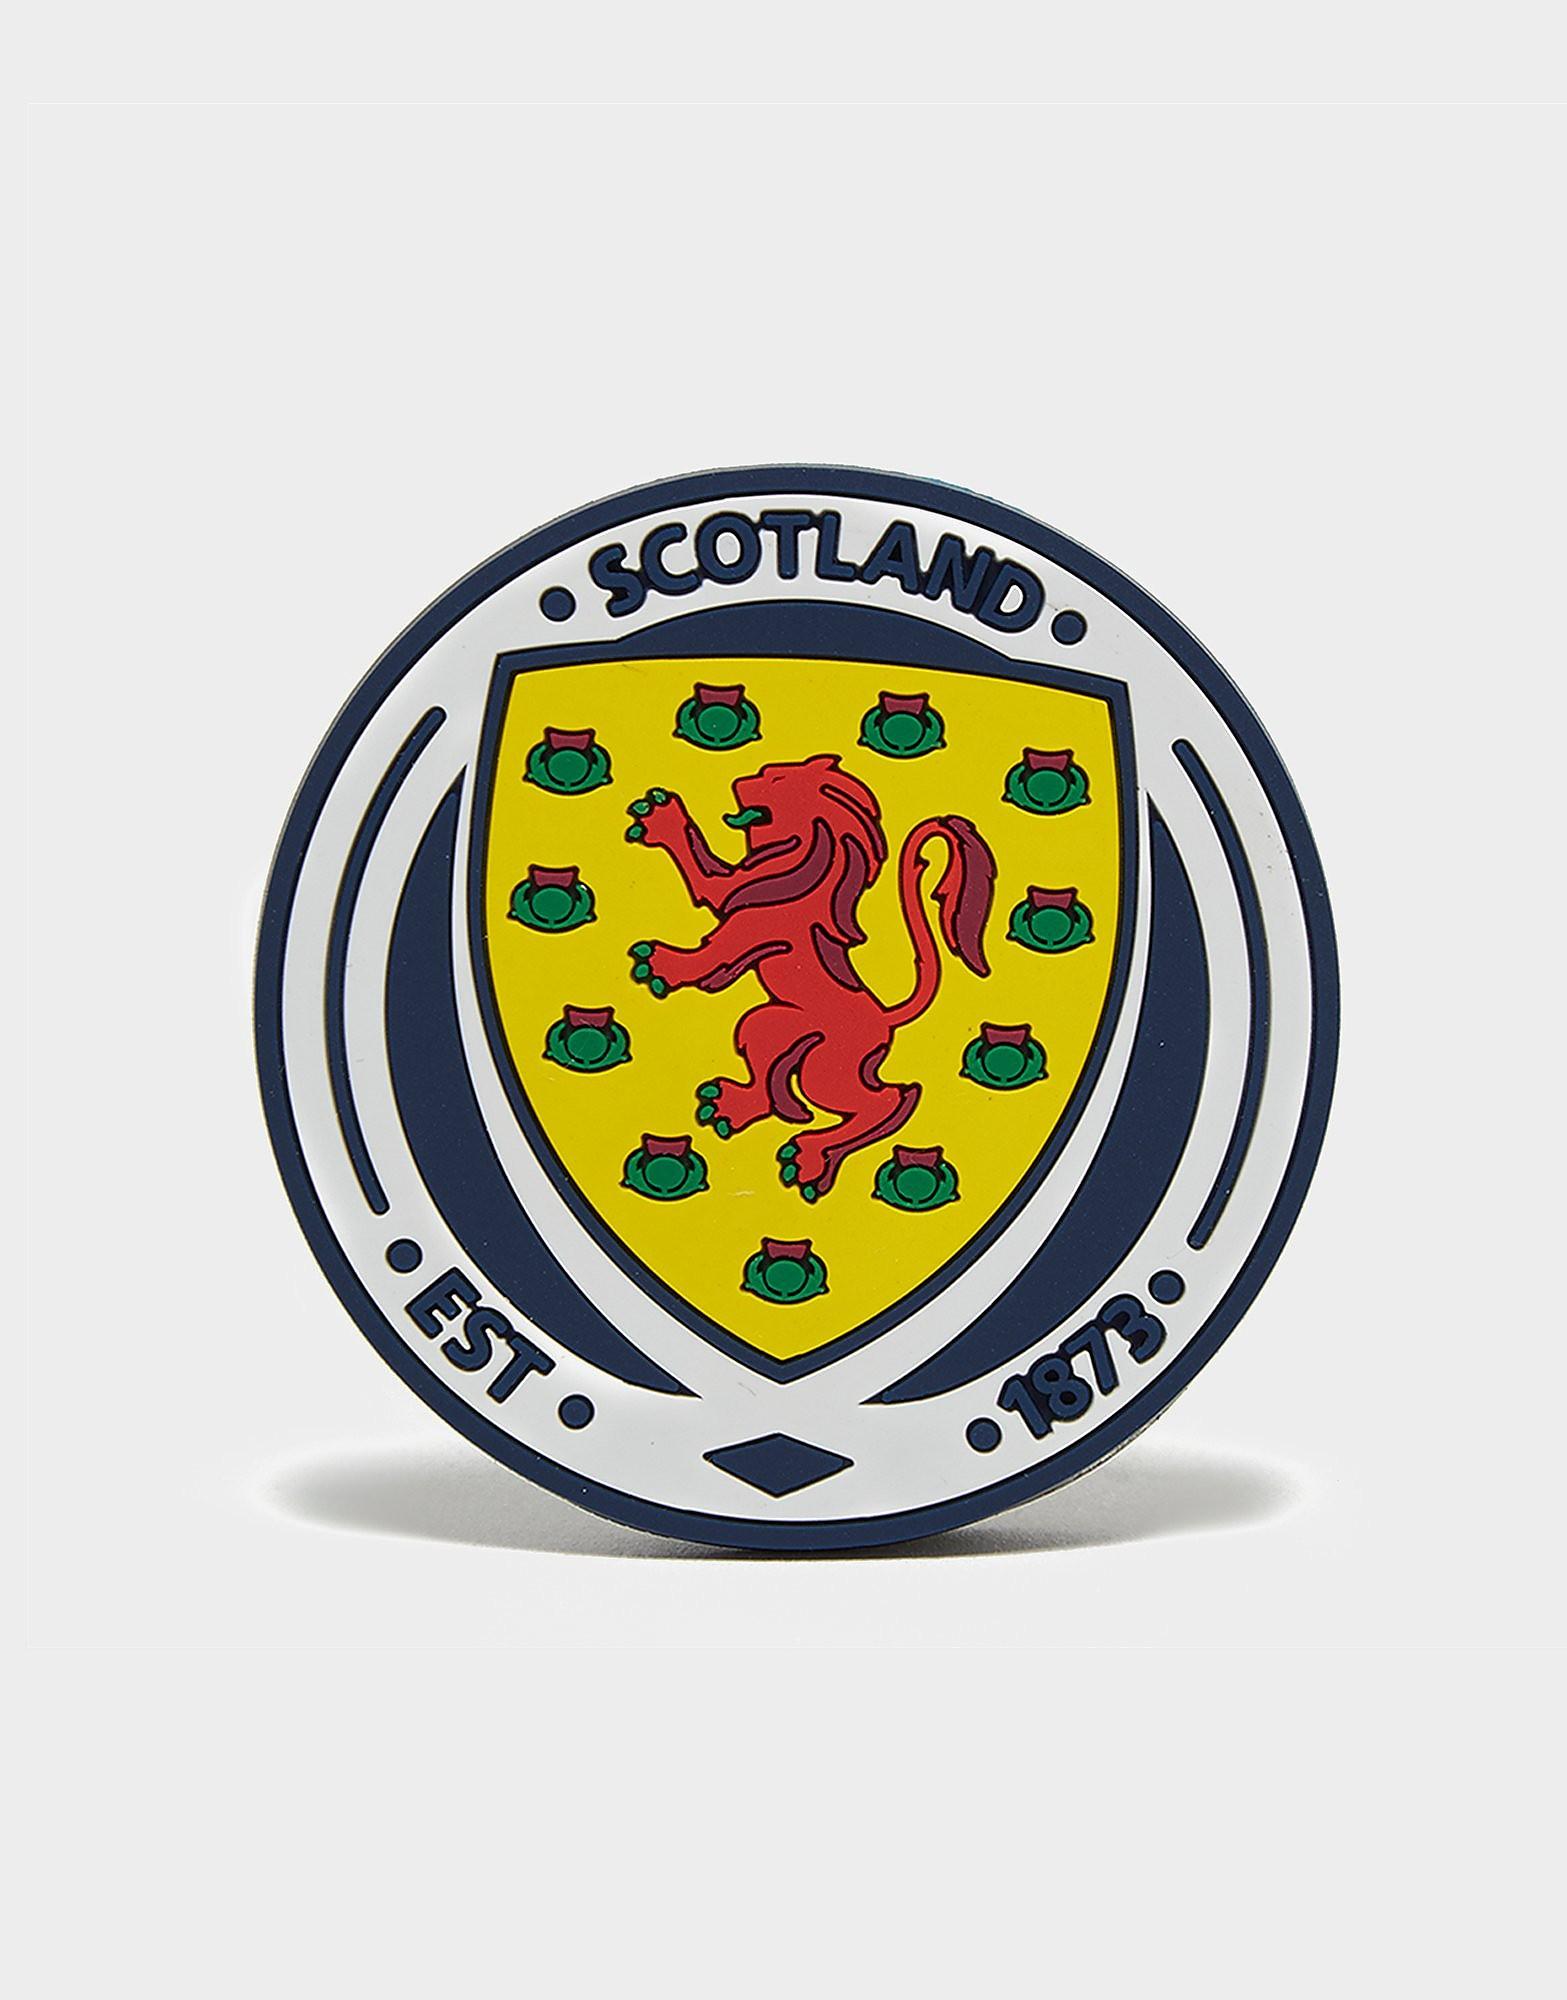 Official Team Magneetembleem FA Scotland - Blauw - Heren